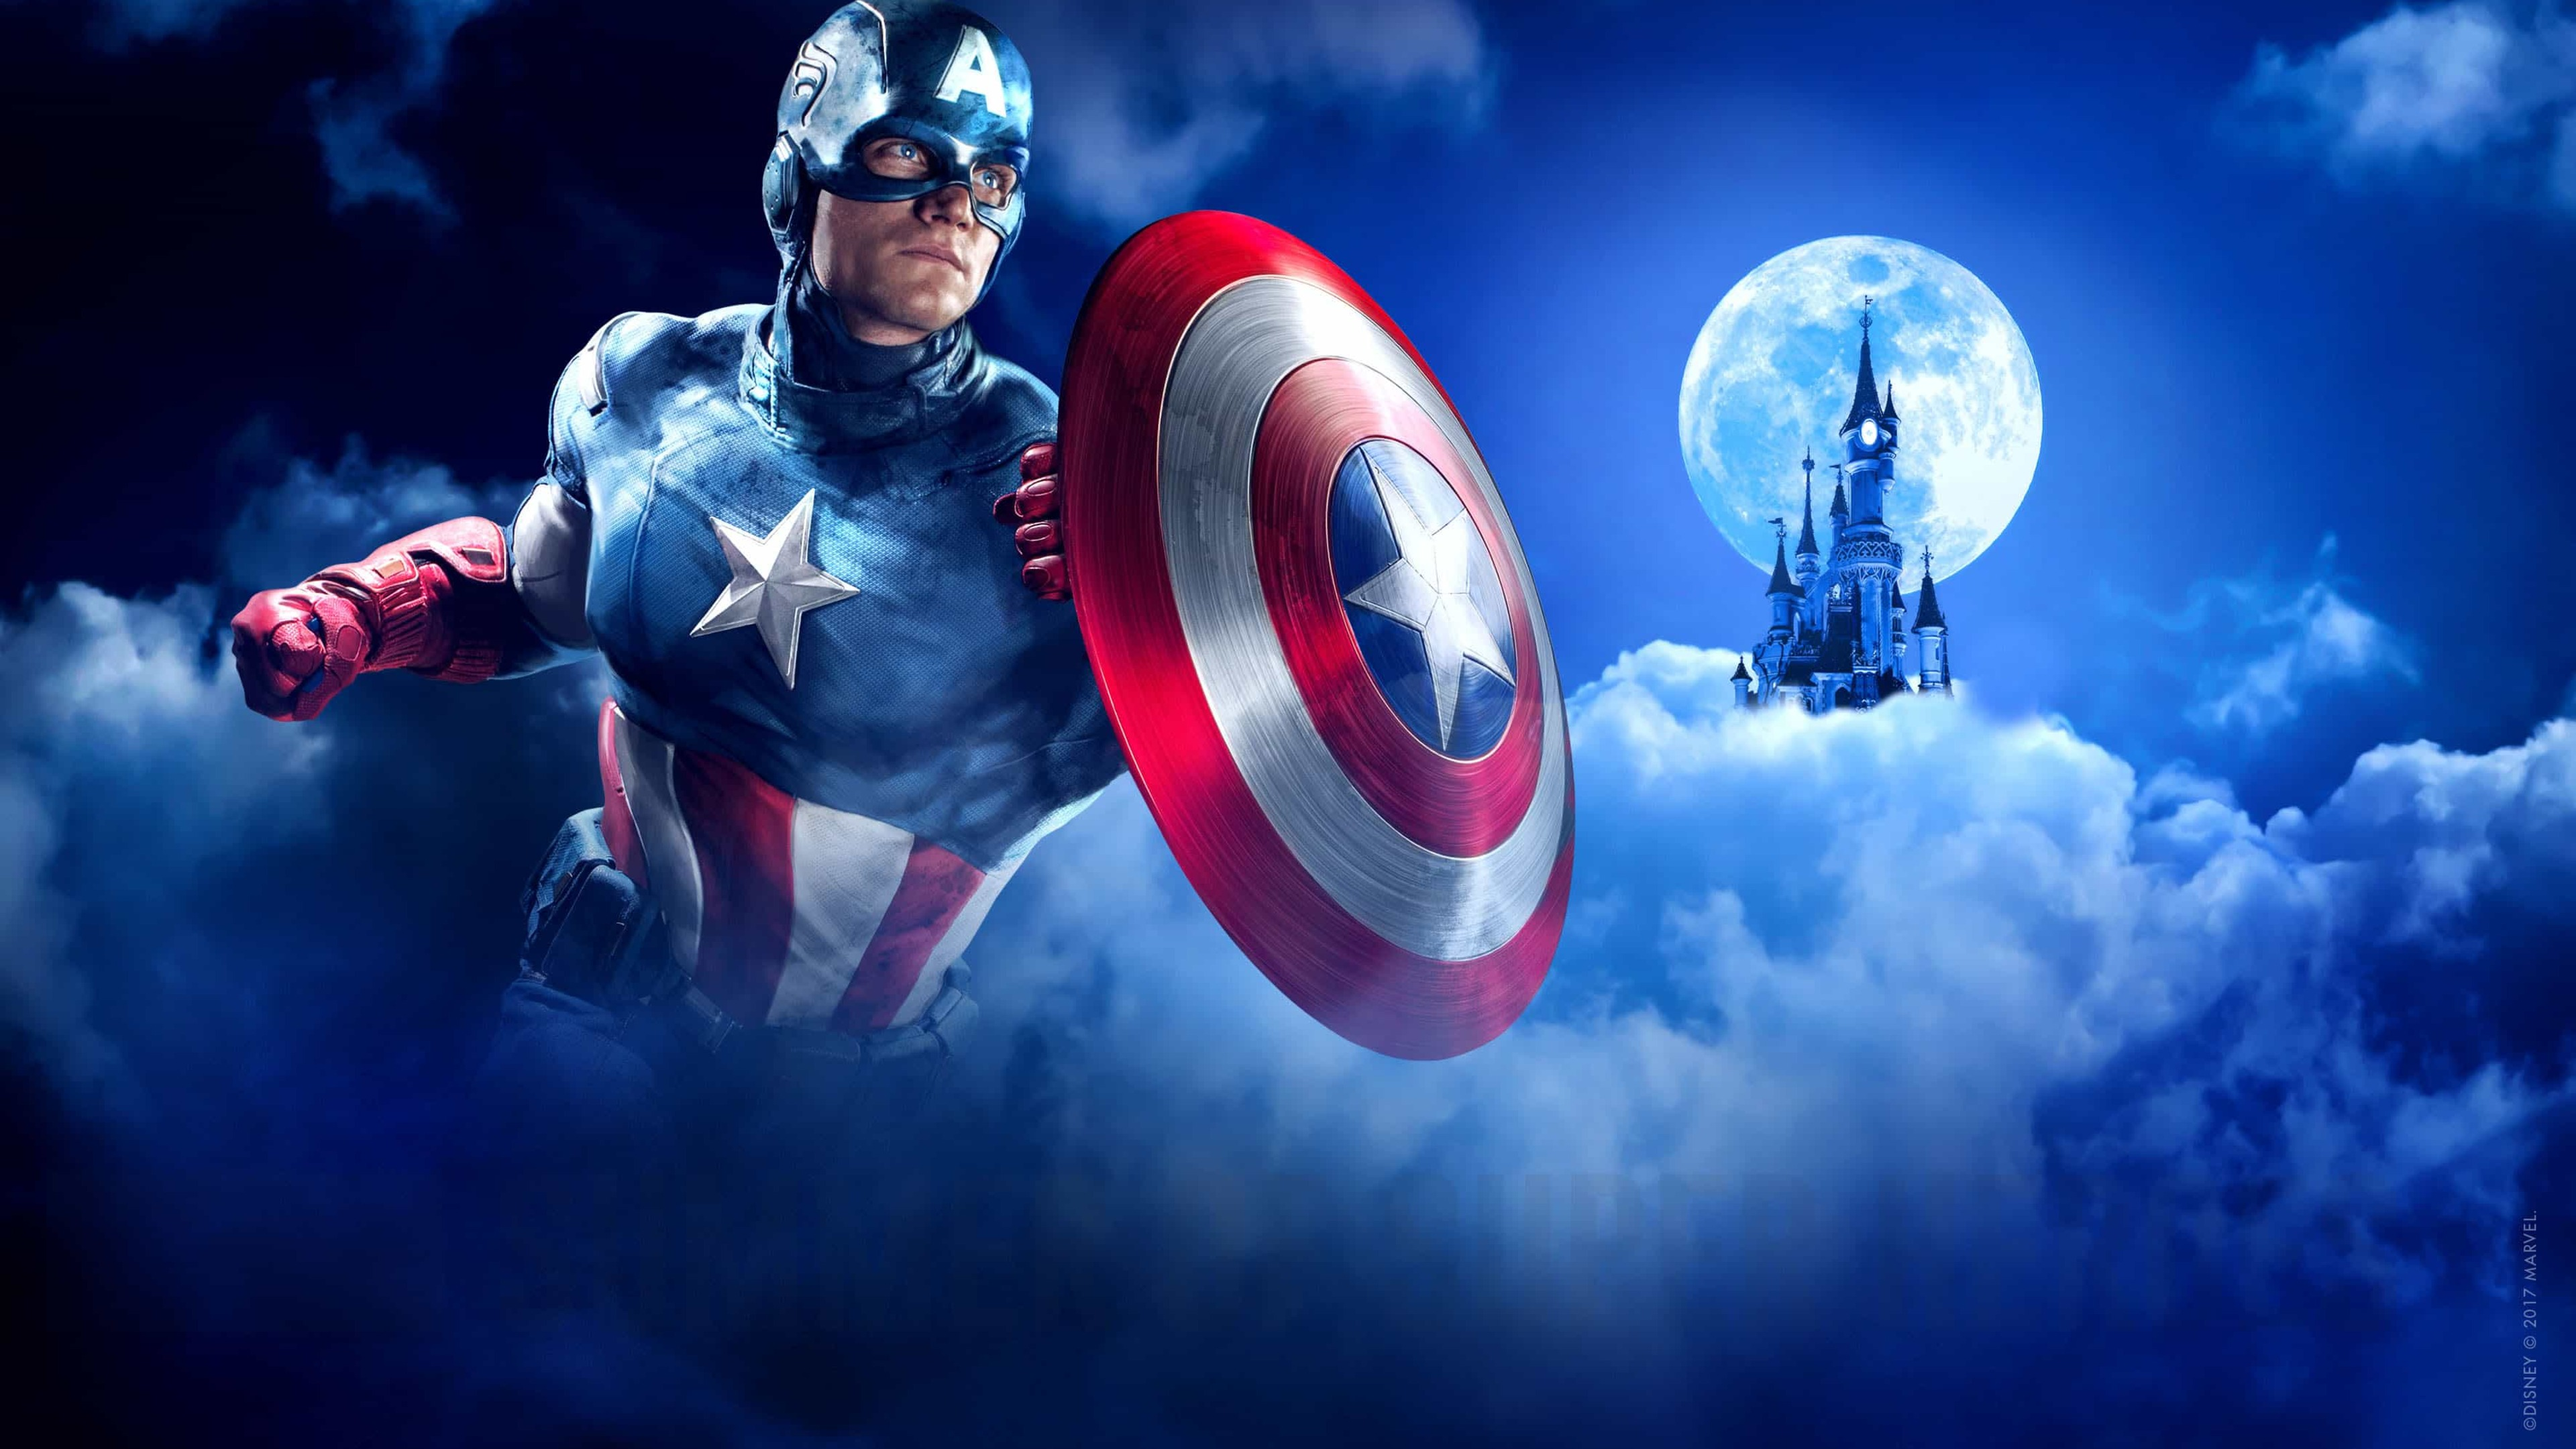 captain america disneyland paris marvel summer of superheroes cz